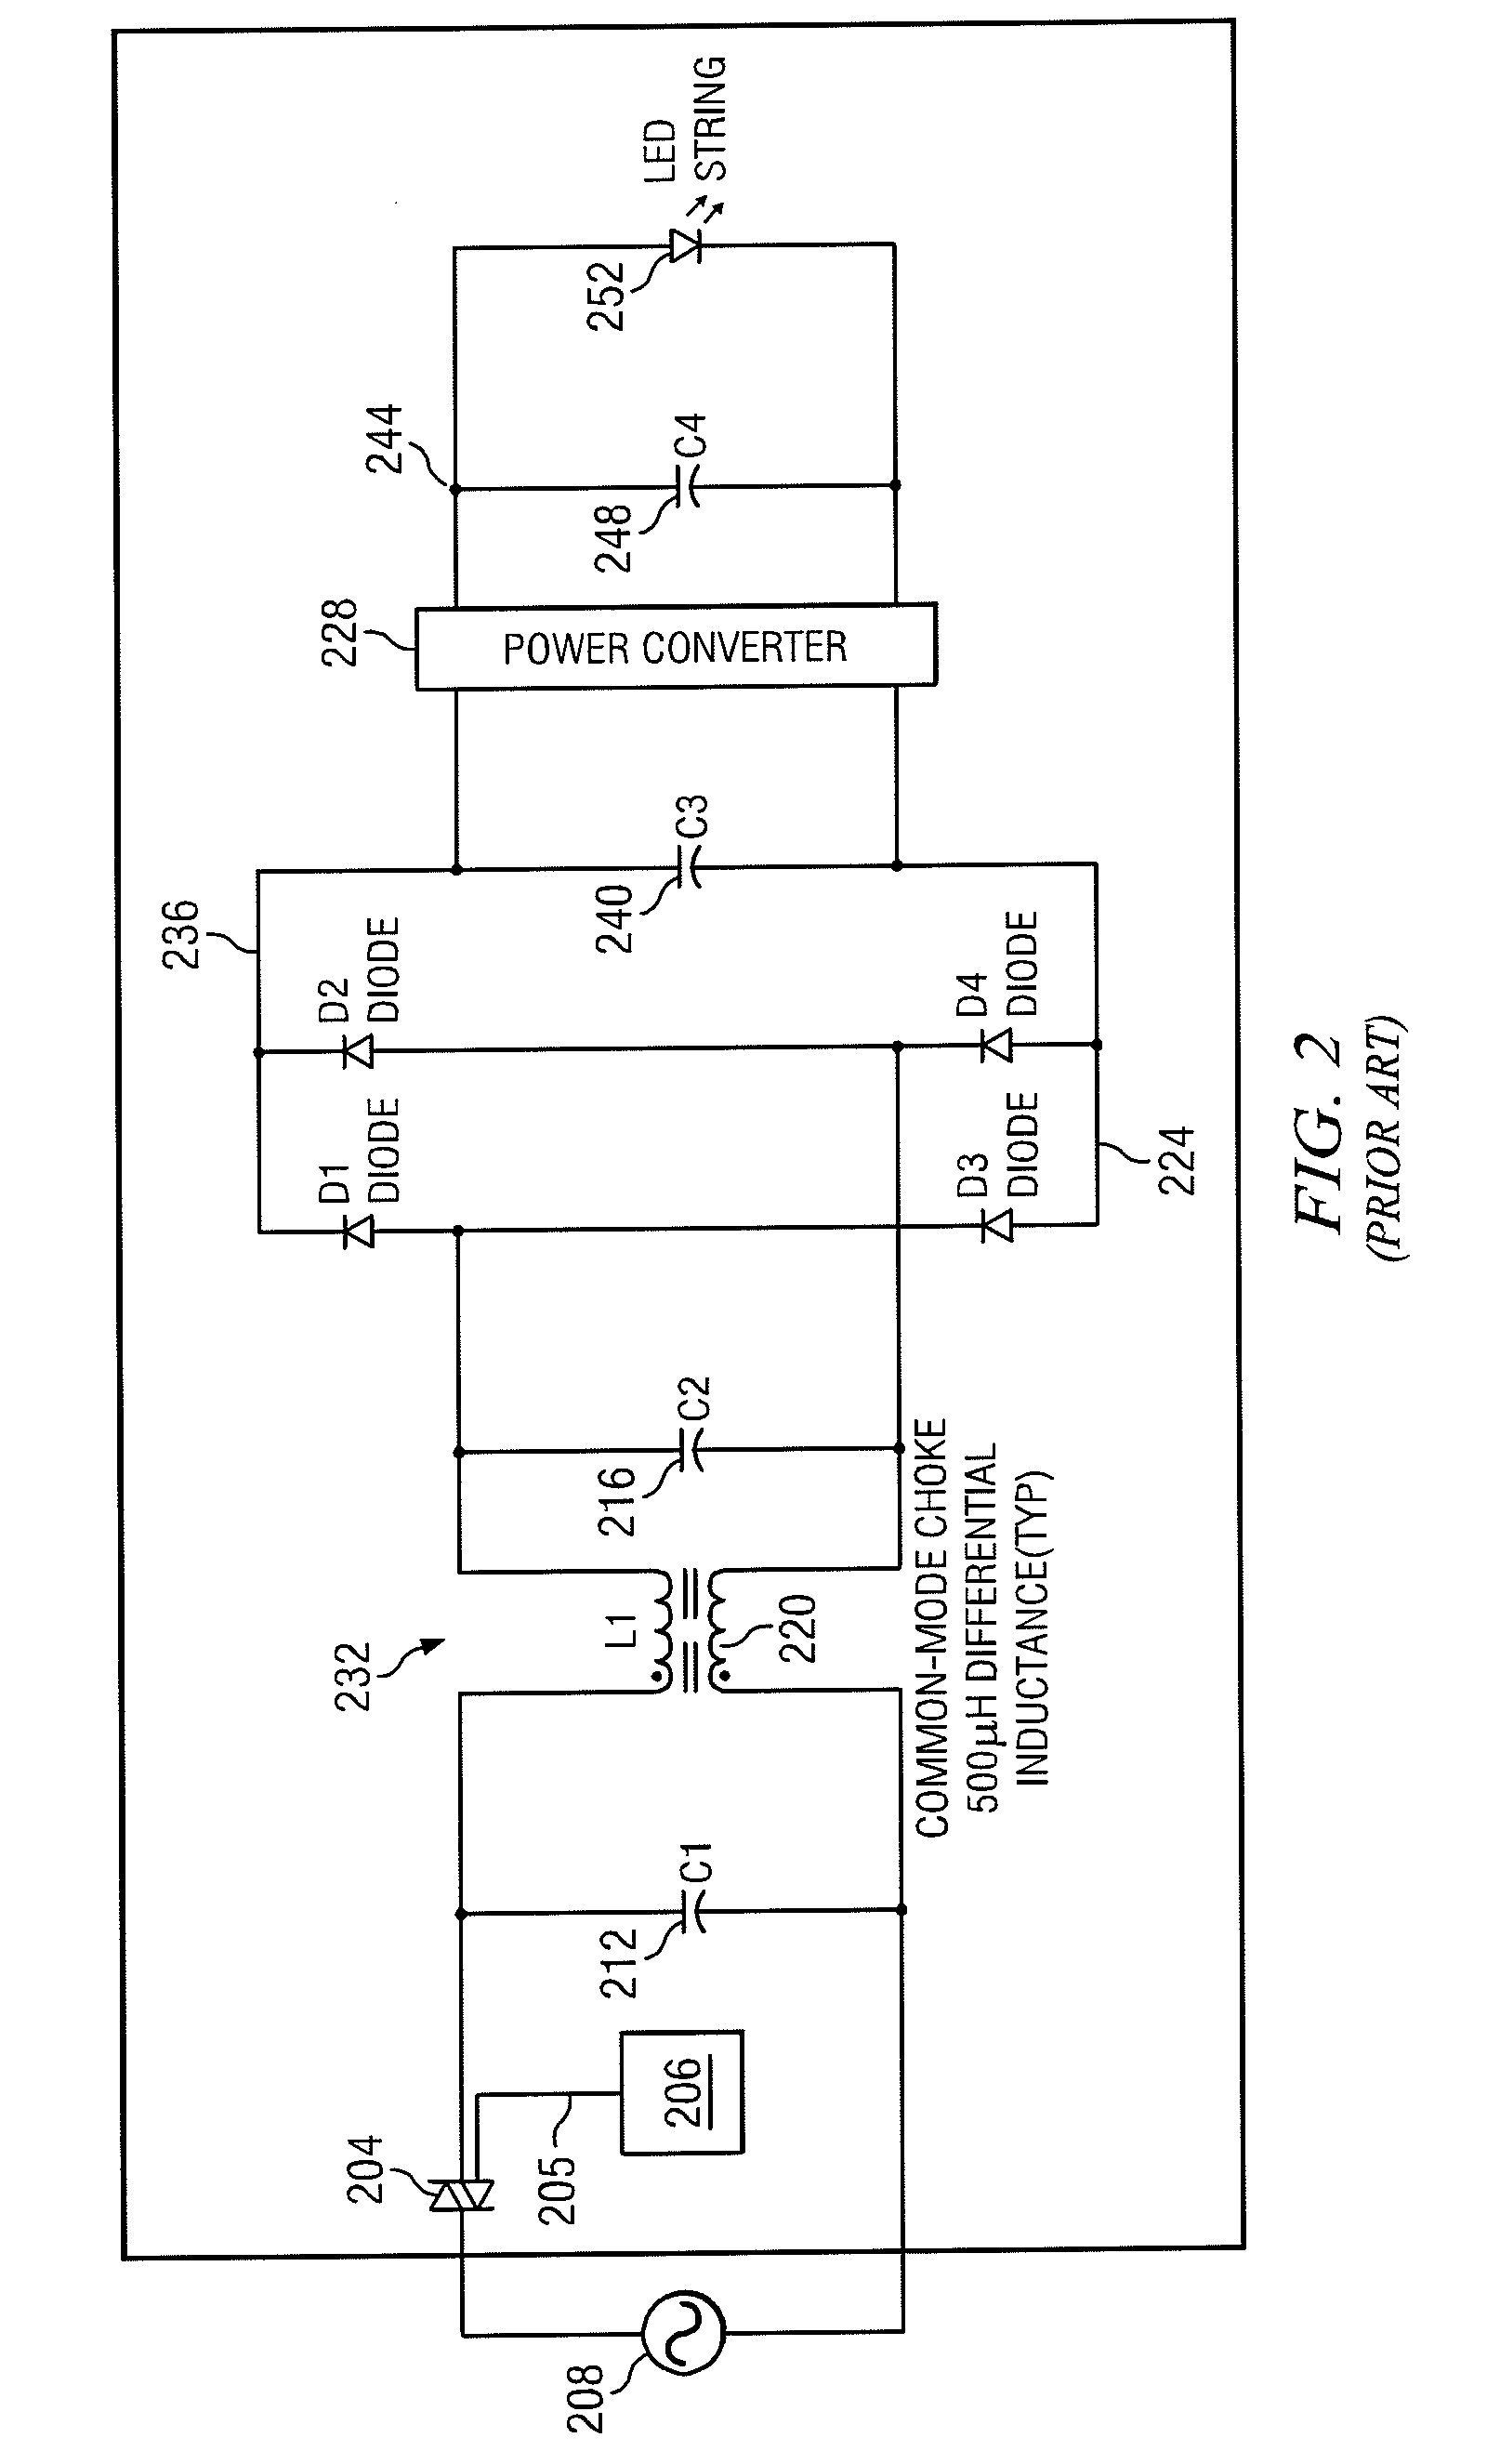 Patent Us20090122580 Thyristor Power Control Circuit Google Patents Drive Scr Flash Diagram Powersupplycircuit Drawing